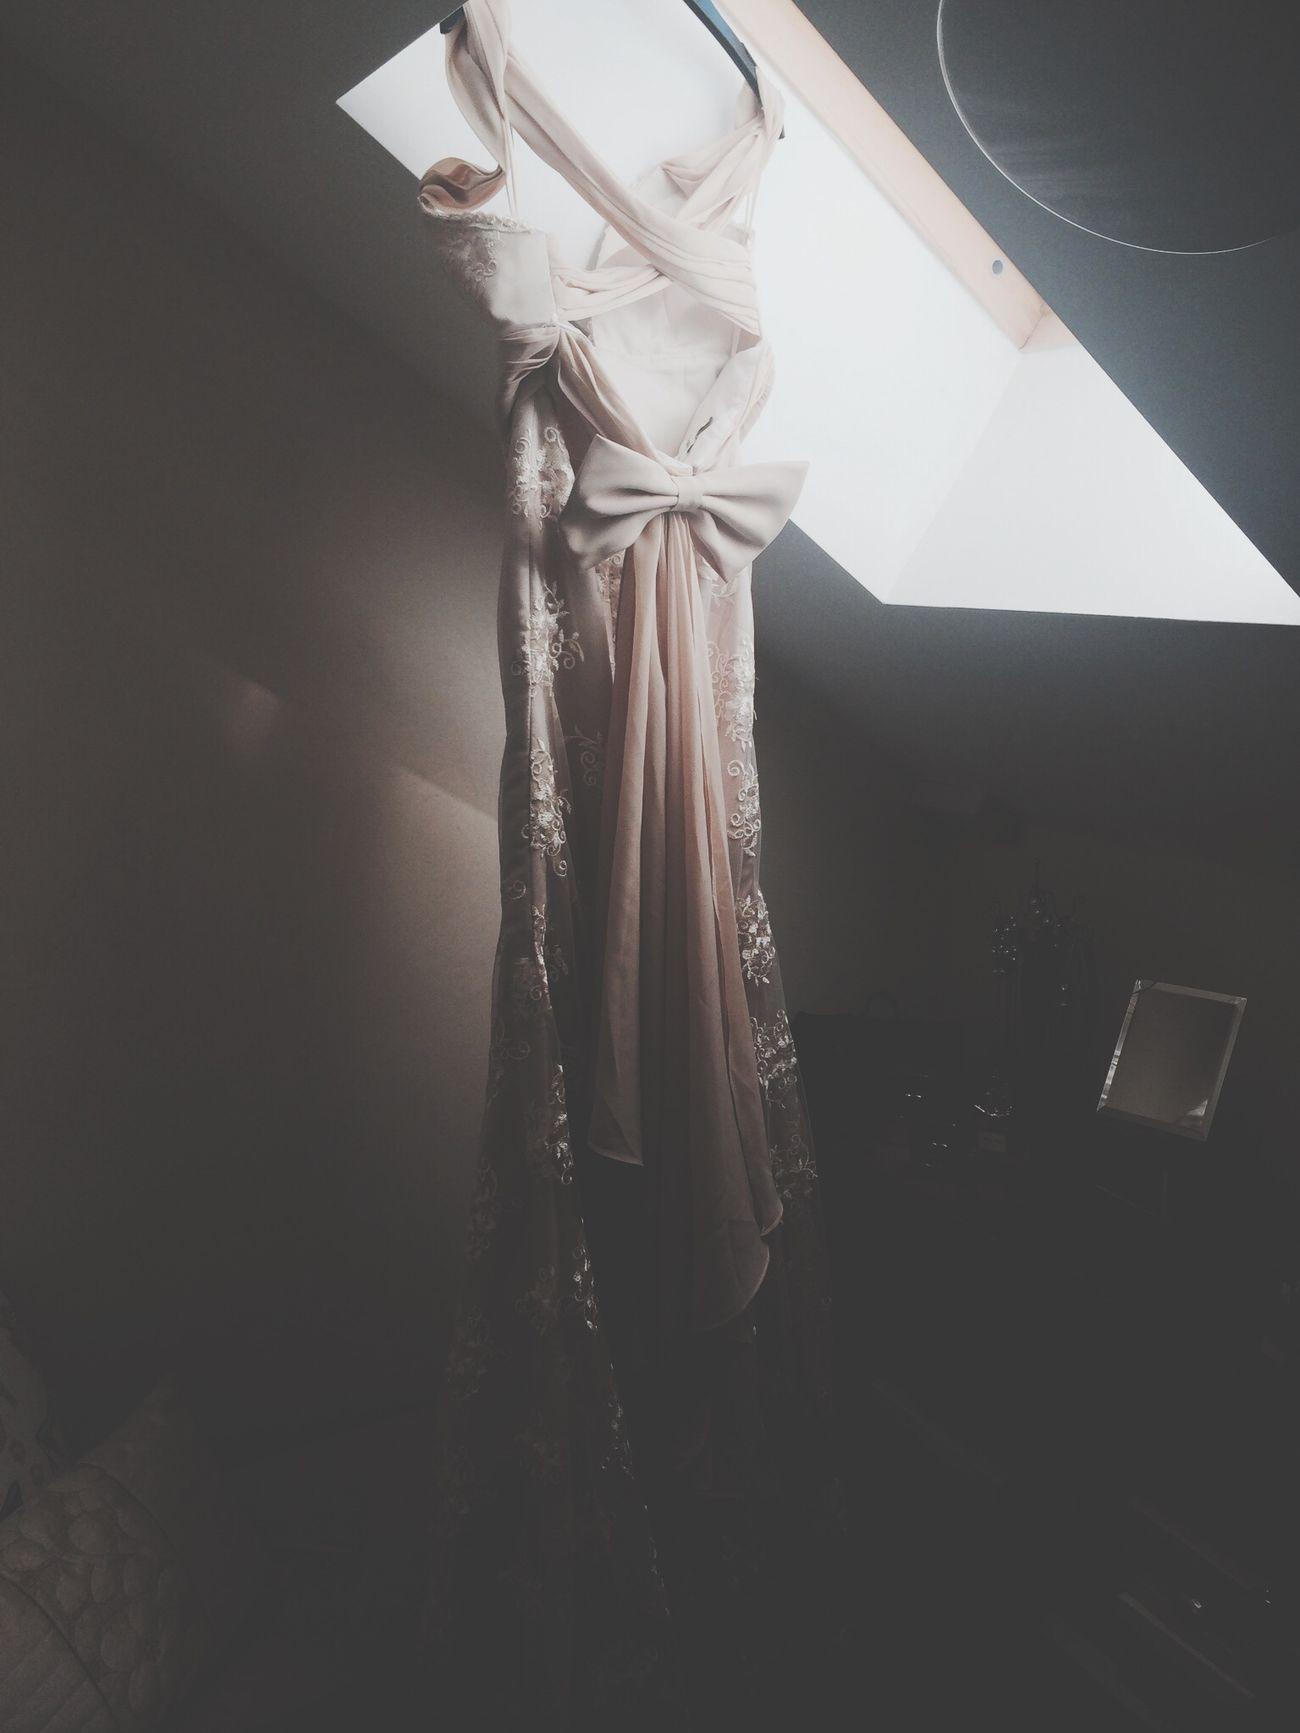 Iphonography New Dress Sneak Peek Www.daringtodreamphotography.com